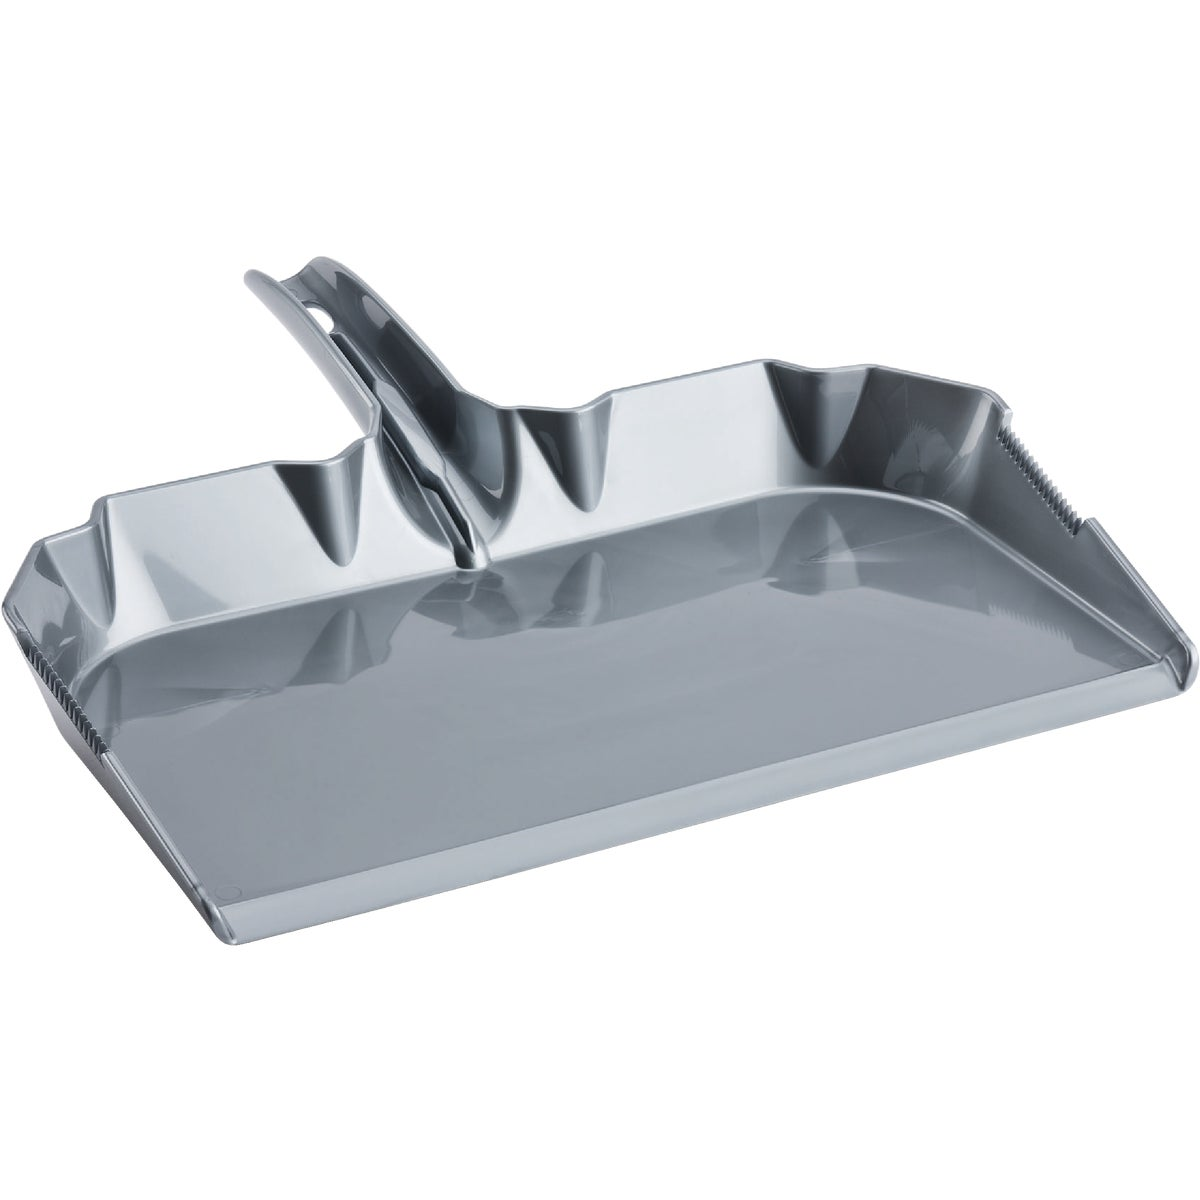 Industrial Grade Dustpan